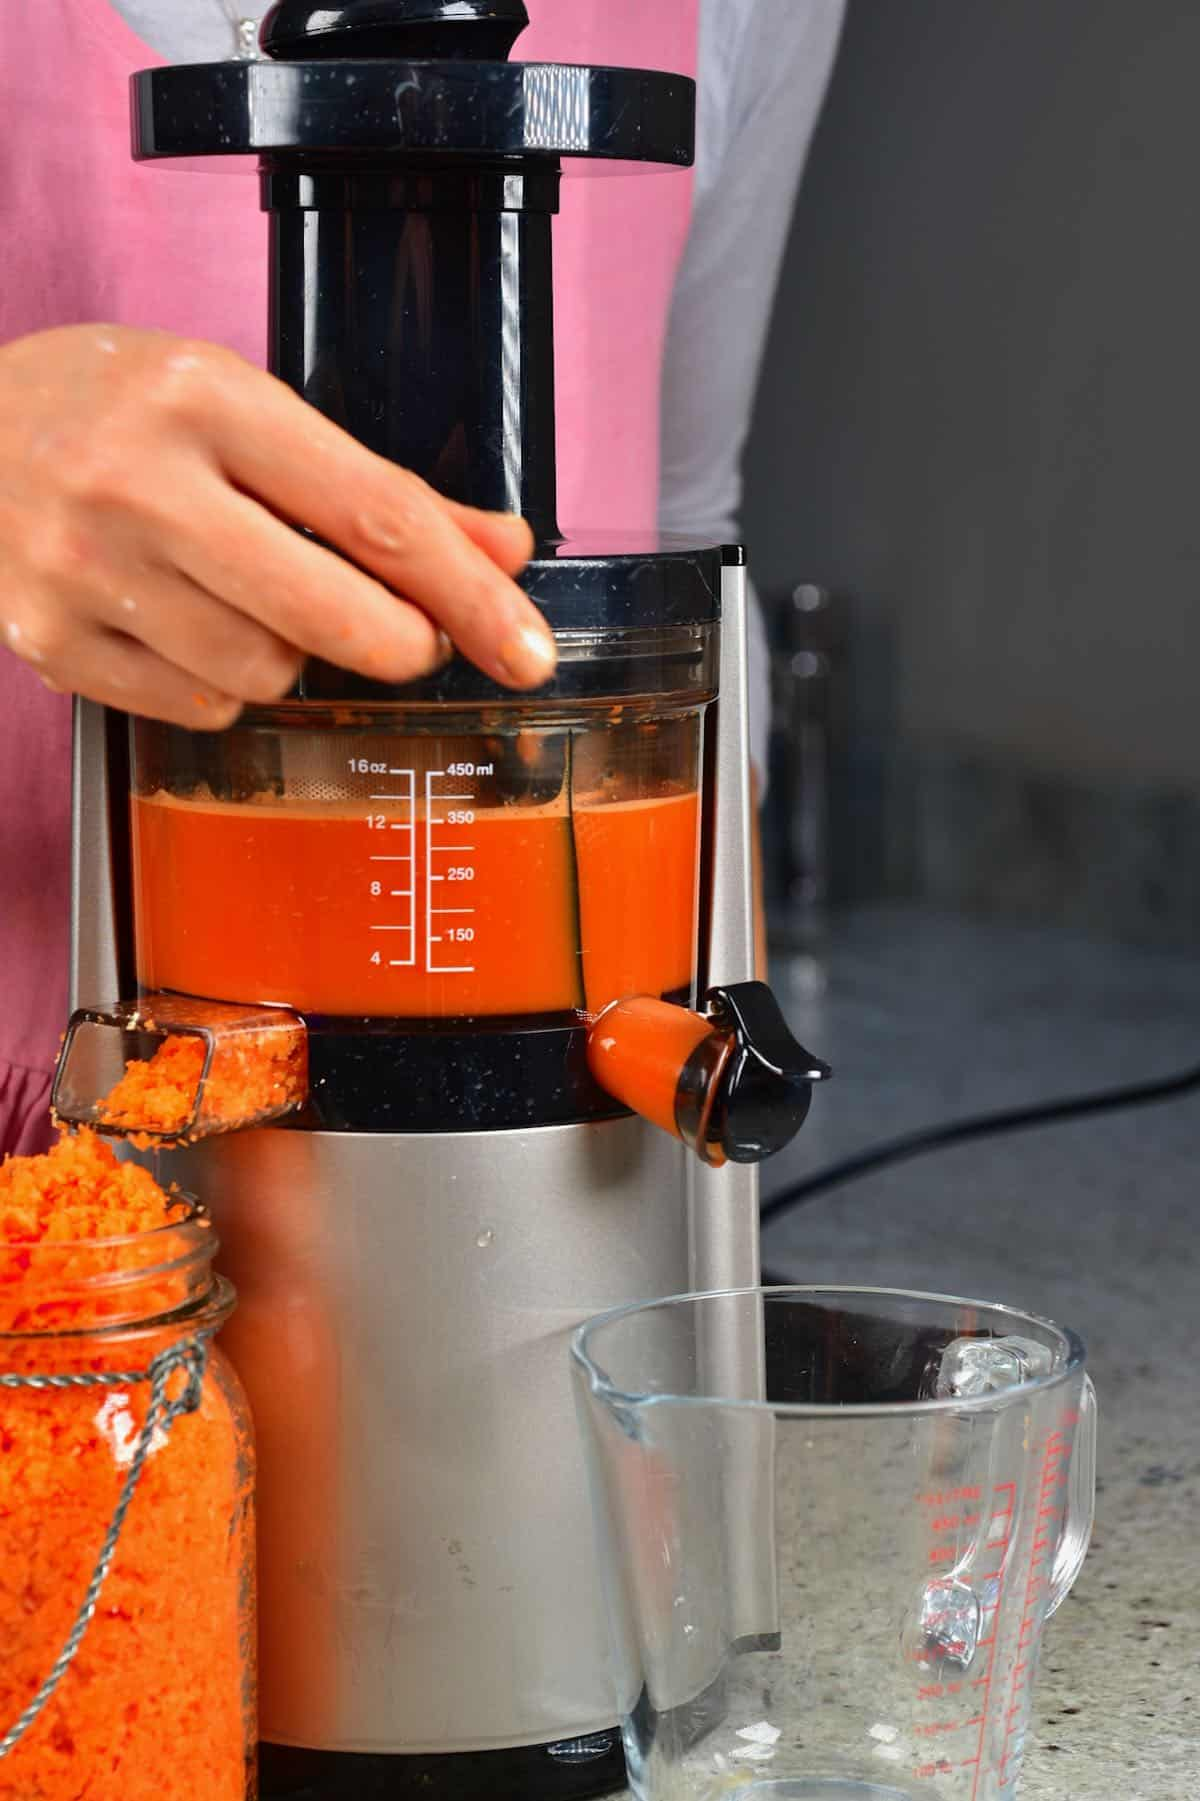 A juicer making carrot juice